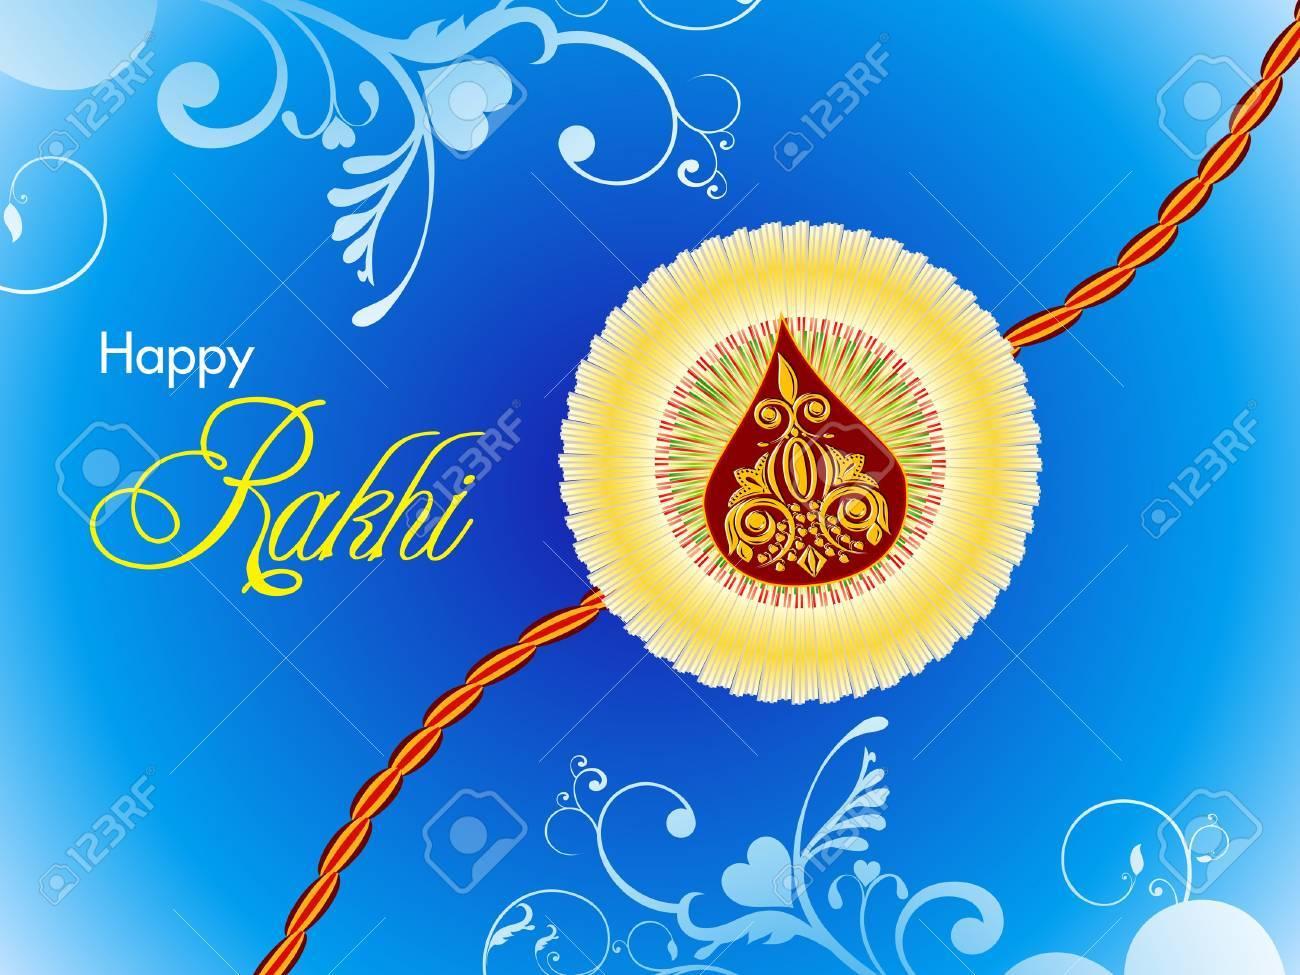 abstract raksha bandhan wallpaper illustration Stock Vector - 14210773